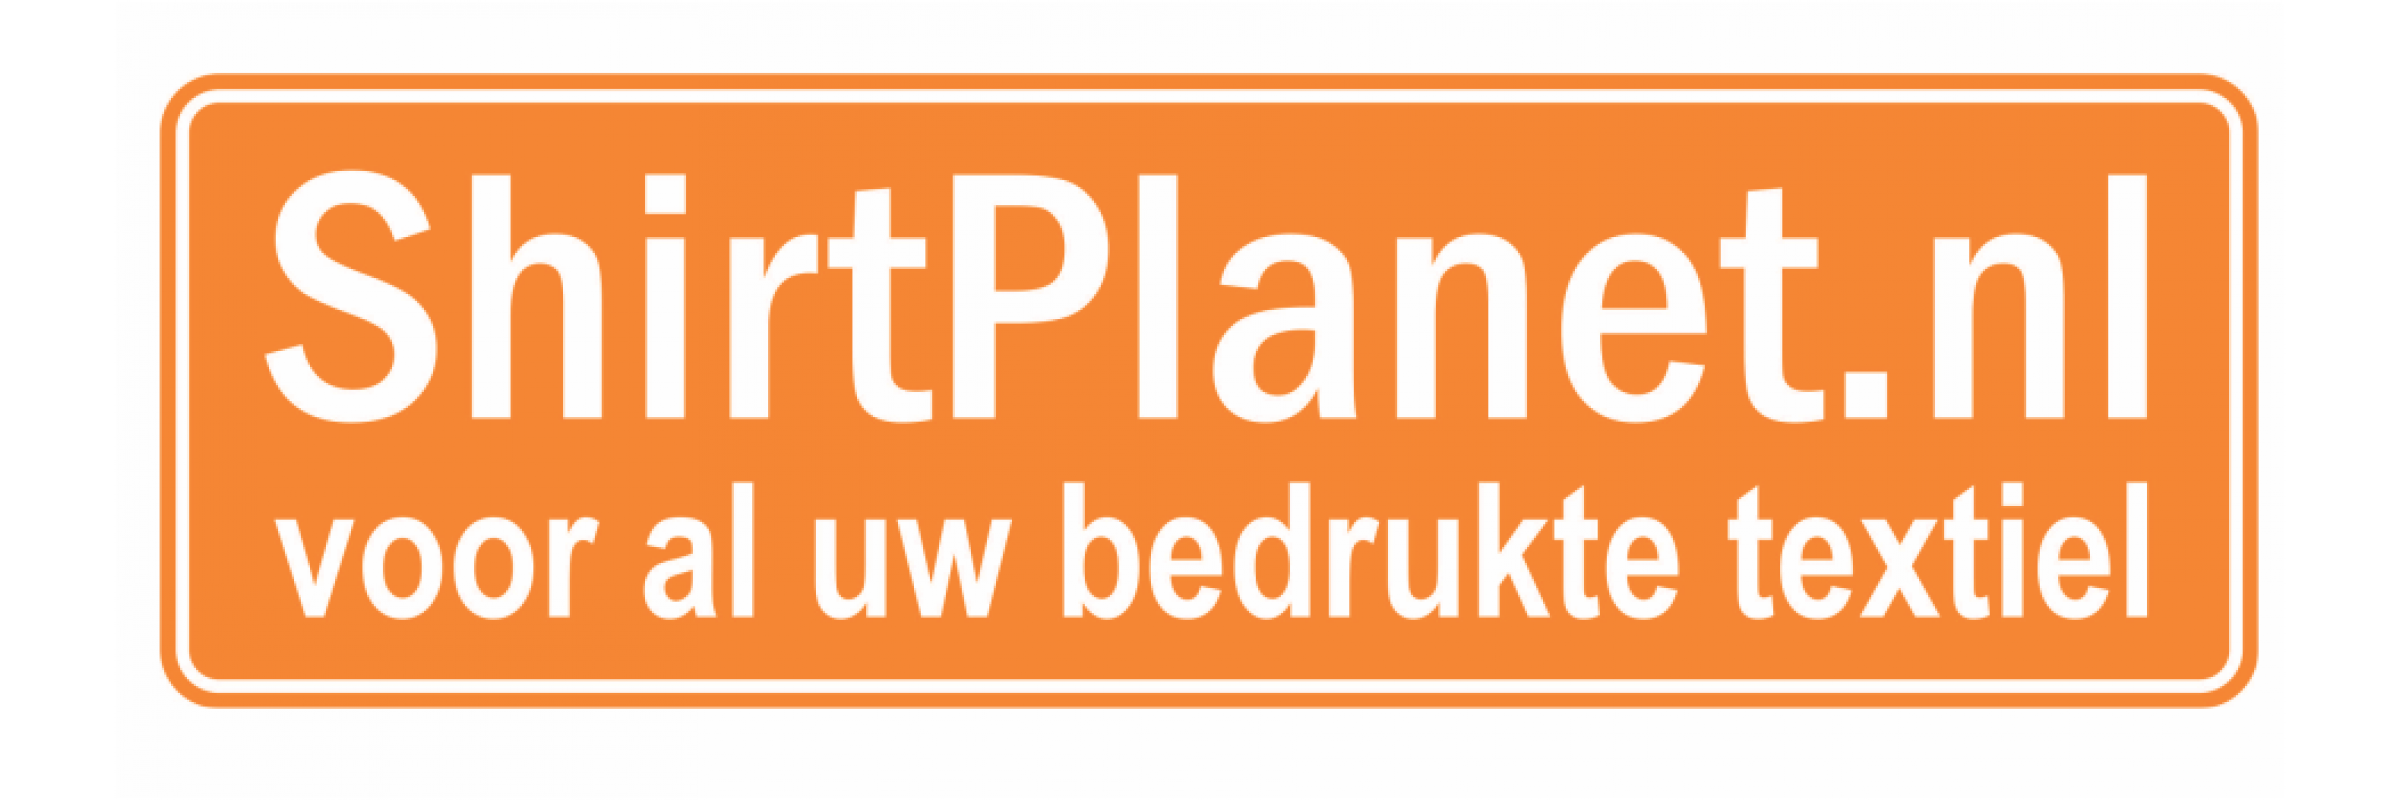 Shirtplanet.nl